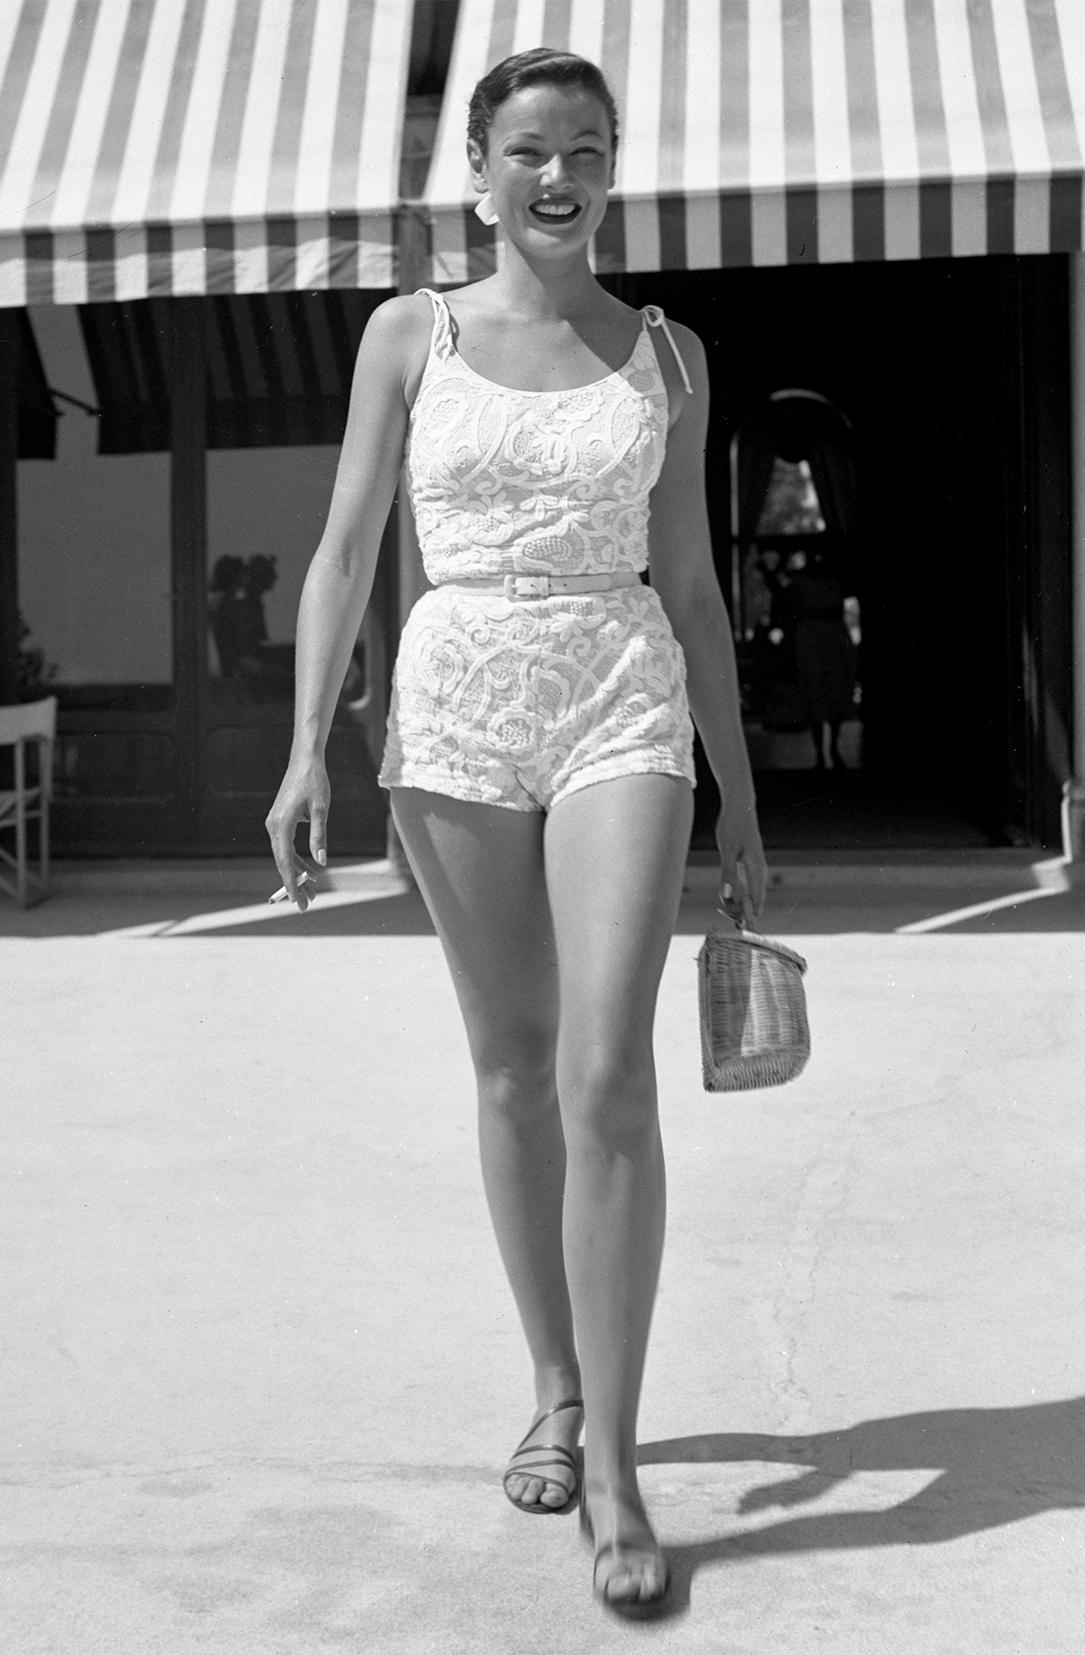 Эротика красивaя год 1950 10 фотография